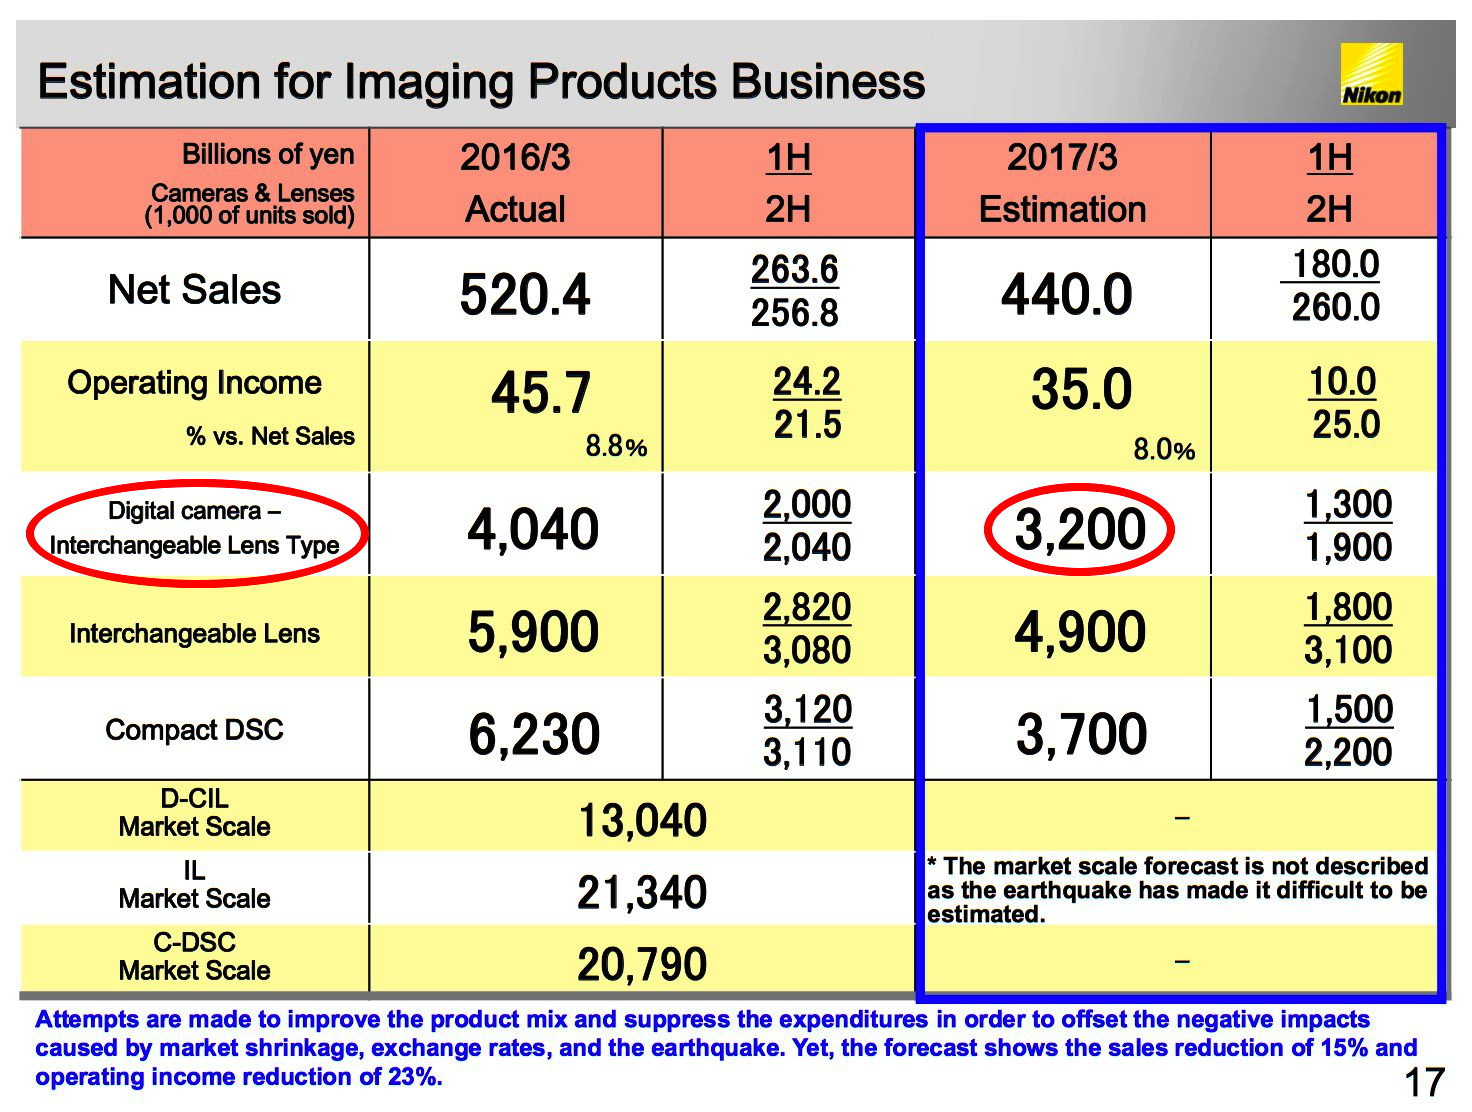 Jahresabschluss – Gedämpfter Optimismus bei Nikon Imaging